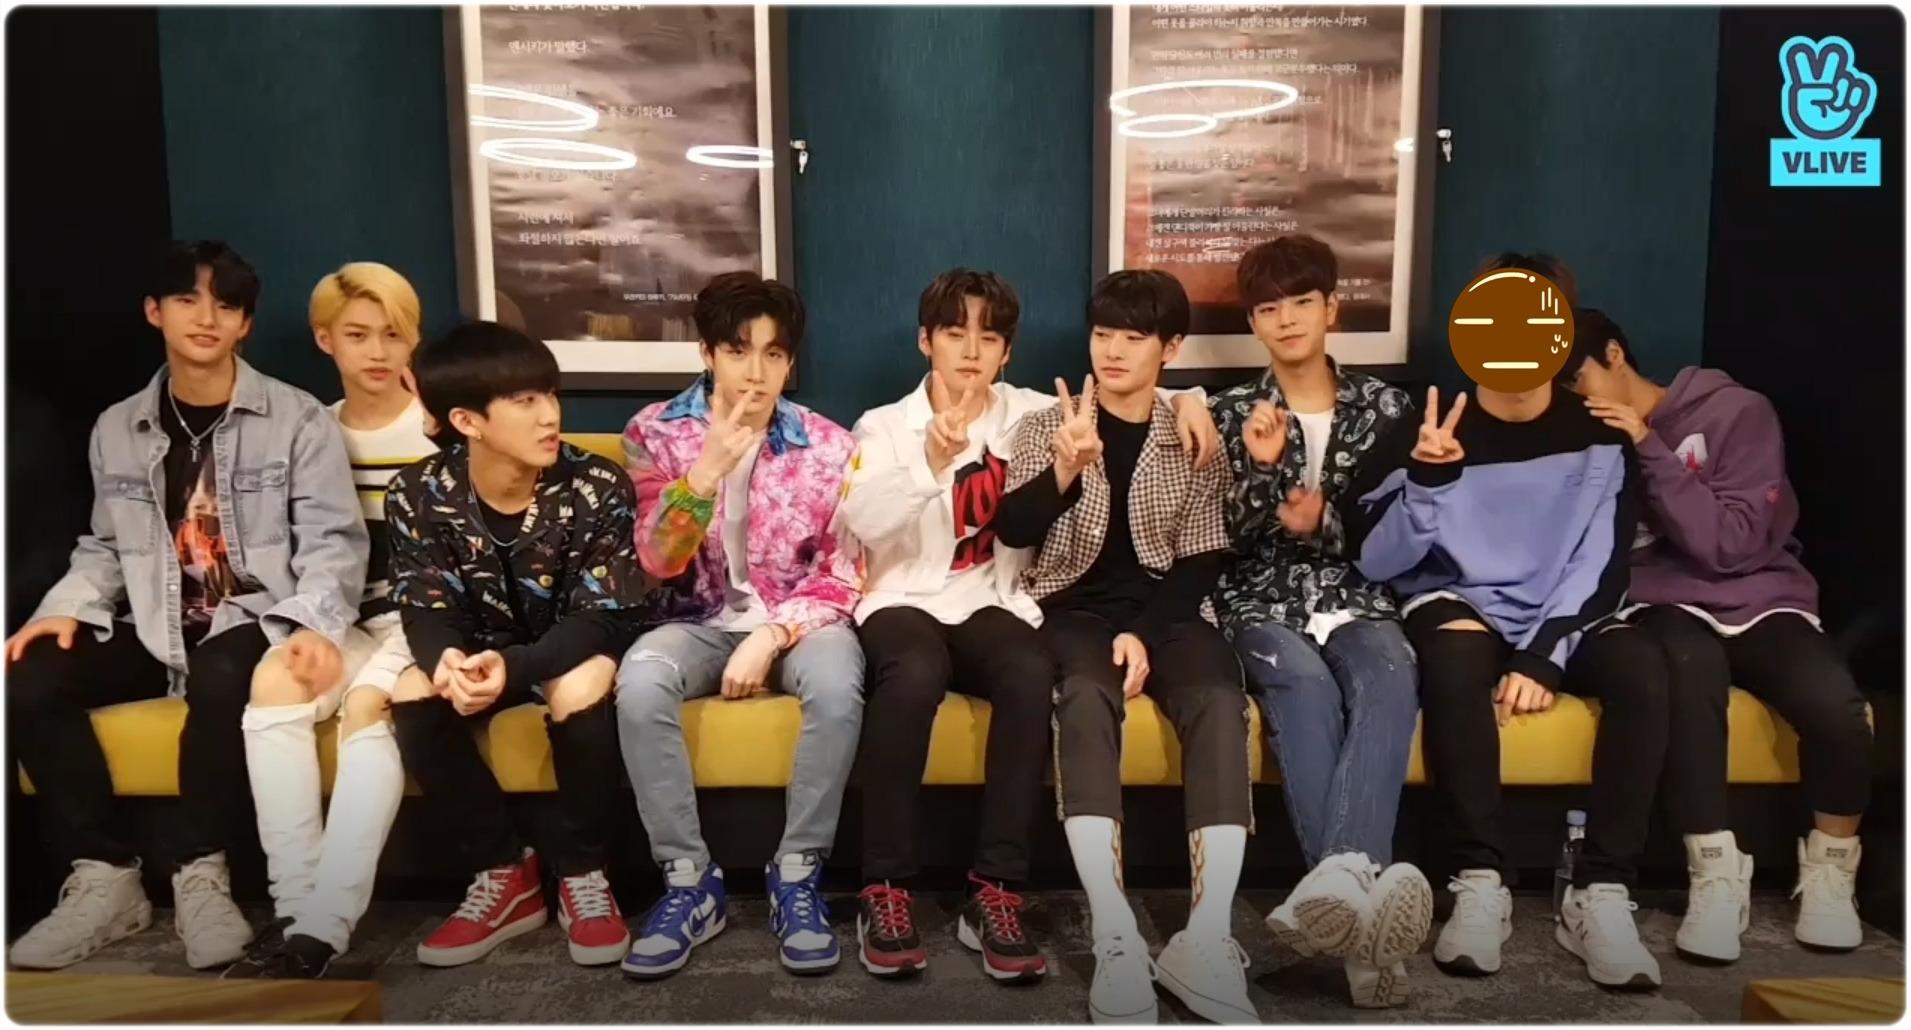 Stray Kids — s2018e85 — [Live] 영화 보러 왔다9🖤